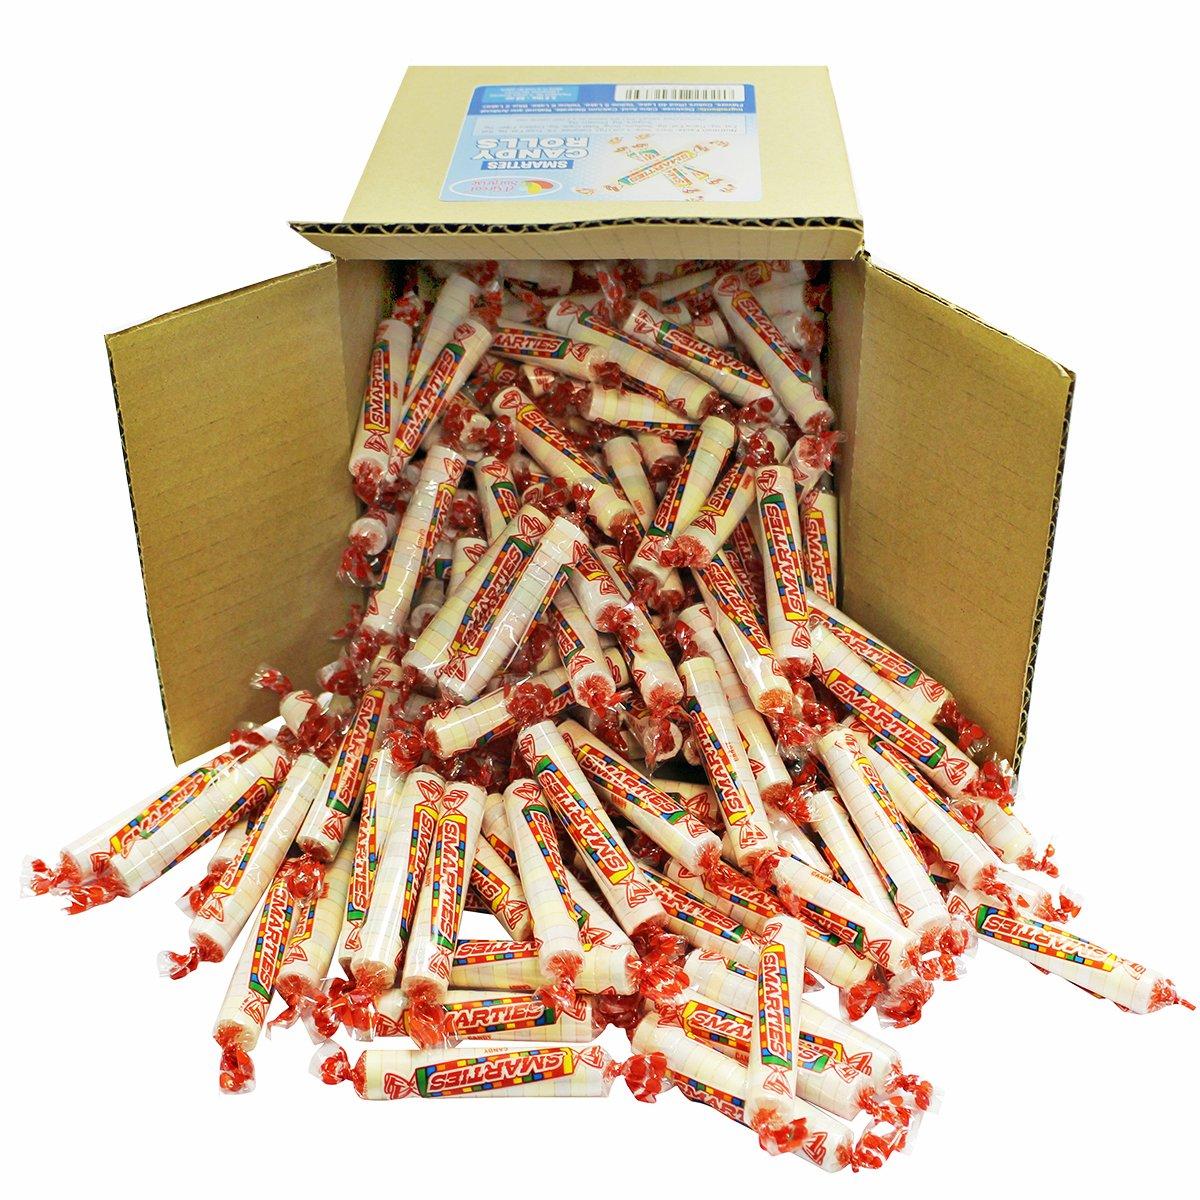 A Great Surprise Caramelos Smarties rollos - Original, 6 x 6 x 6 caja caramelo a granel 3,2 libras - 52oz: Amazon.es: Hogar